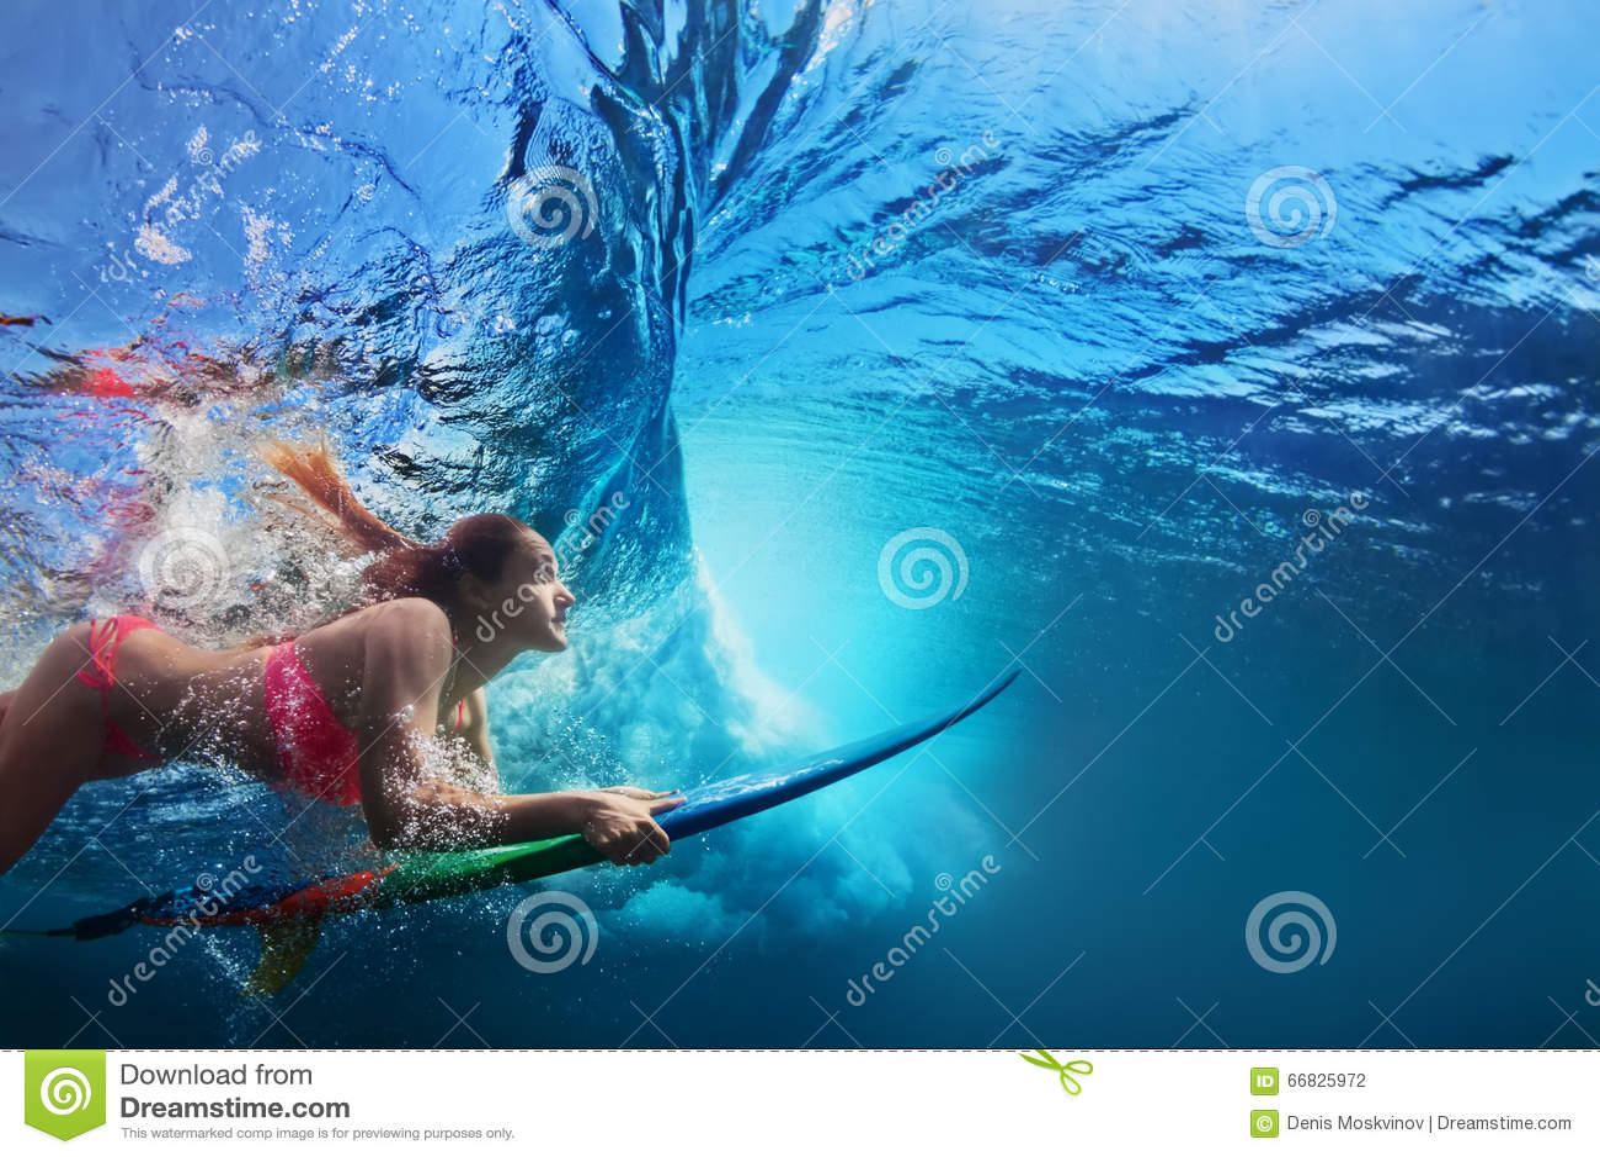 Underwater photo of surfer girl diving under ocean wave